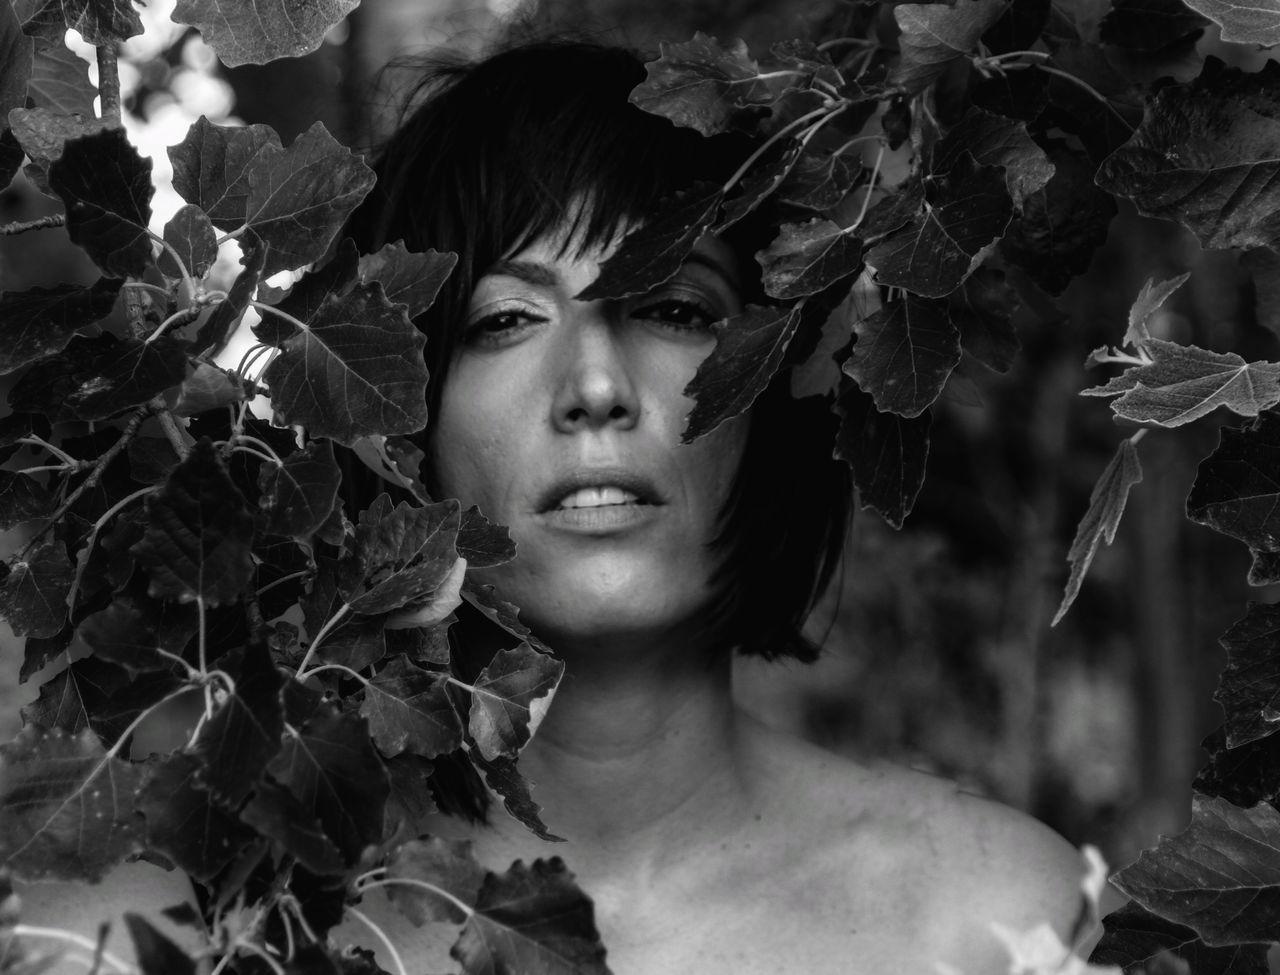 Beautiful Woman Beautiful People Women Nature Eyeemphotography Female Community My Bw Obsession The Portraitist - 2017 EyeEm Awards